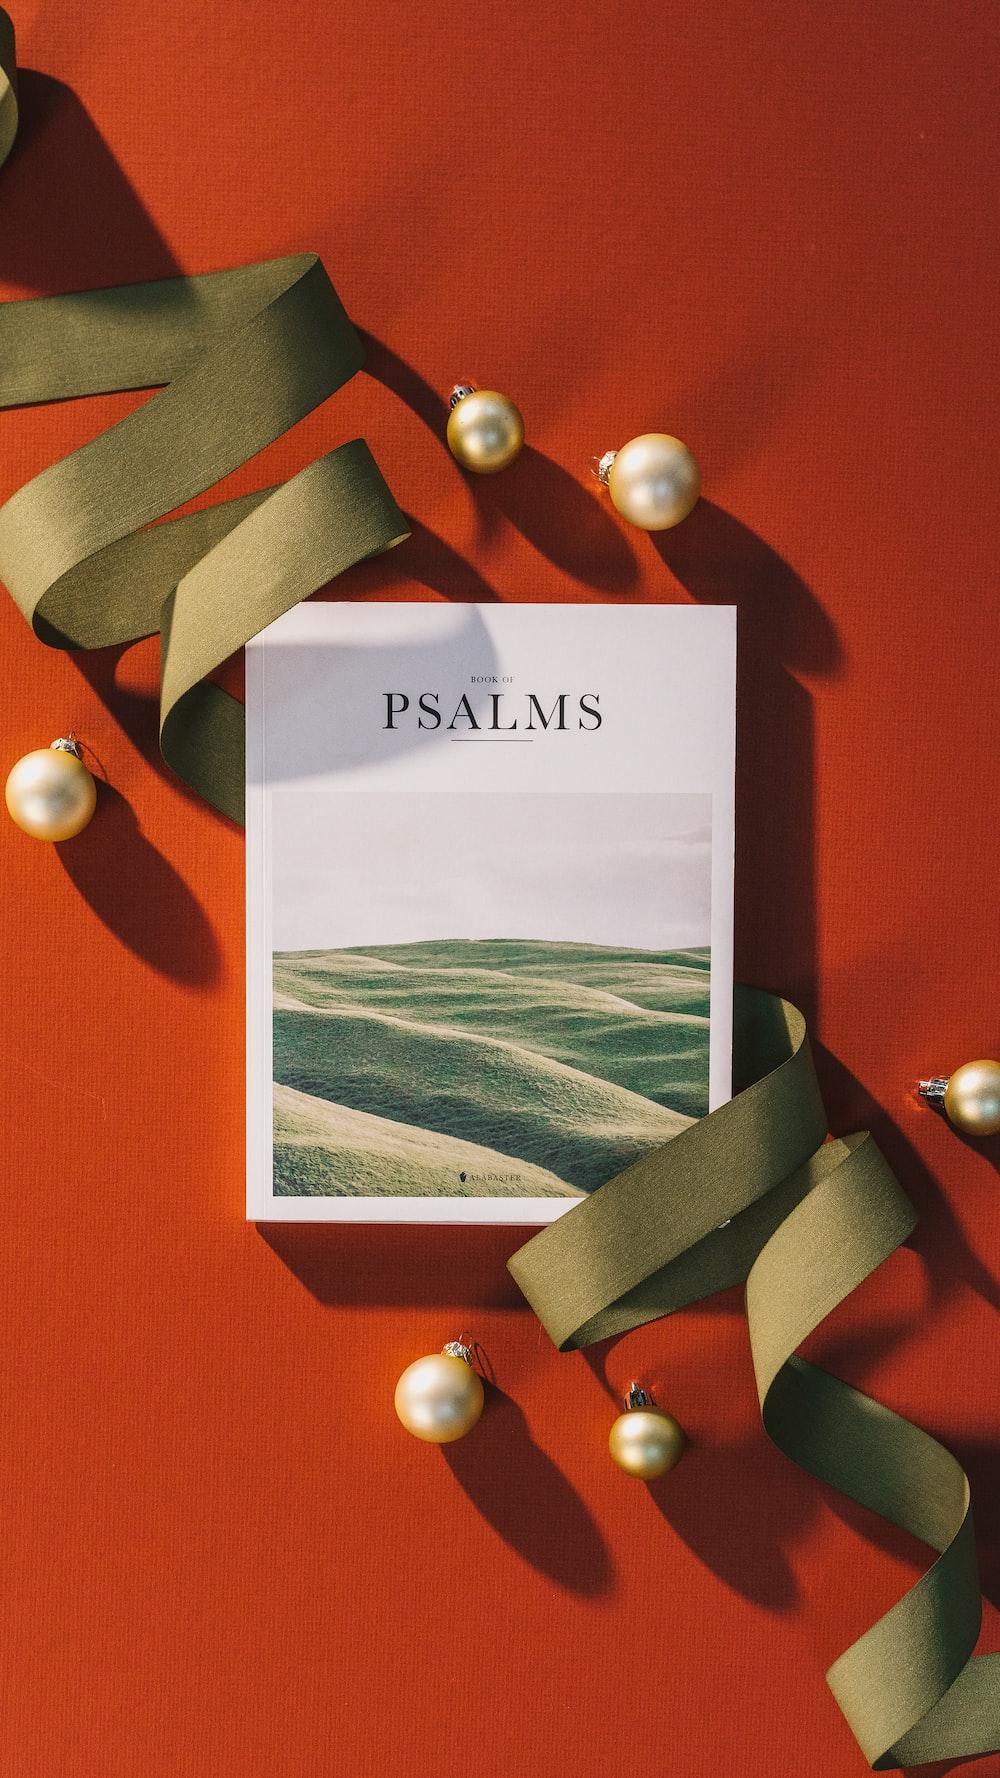 Psalms poster